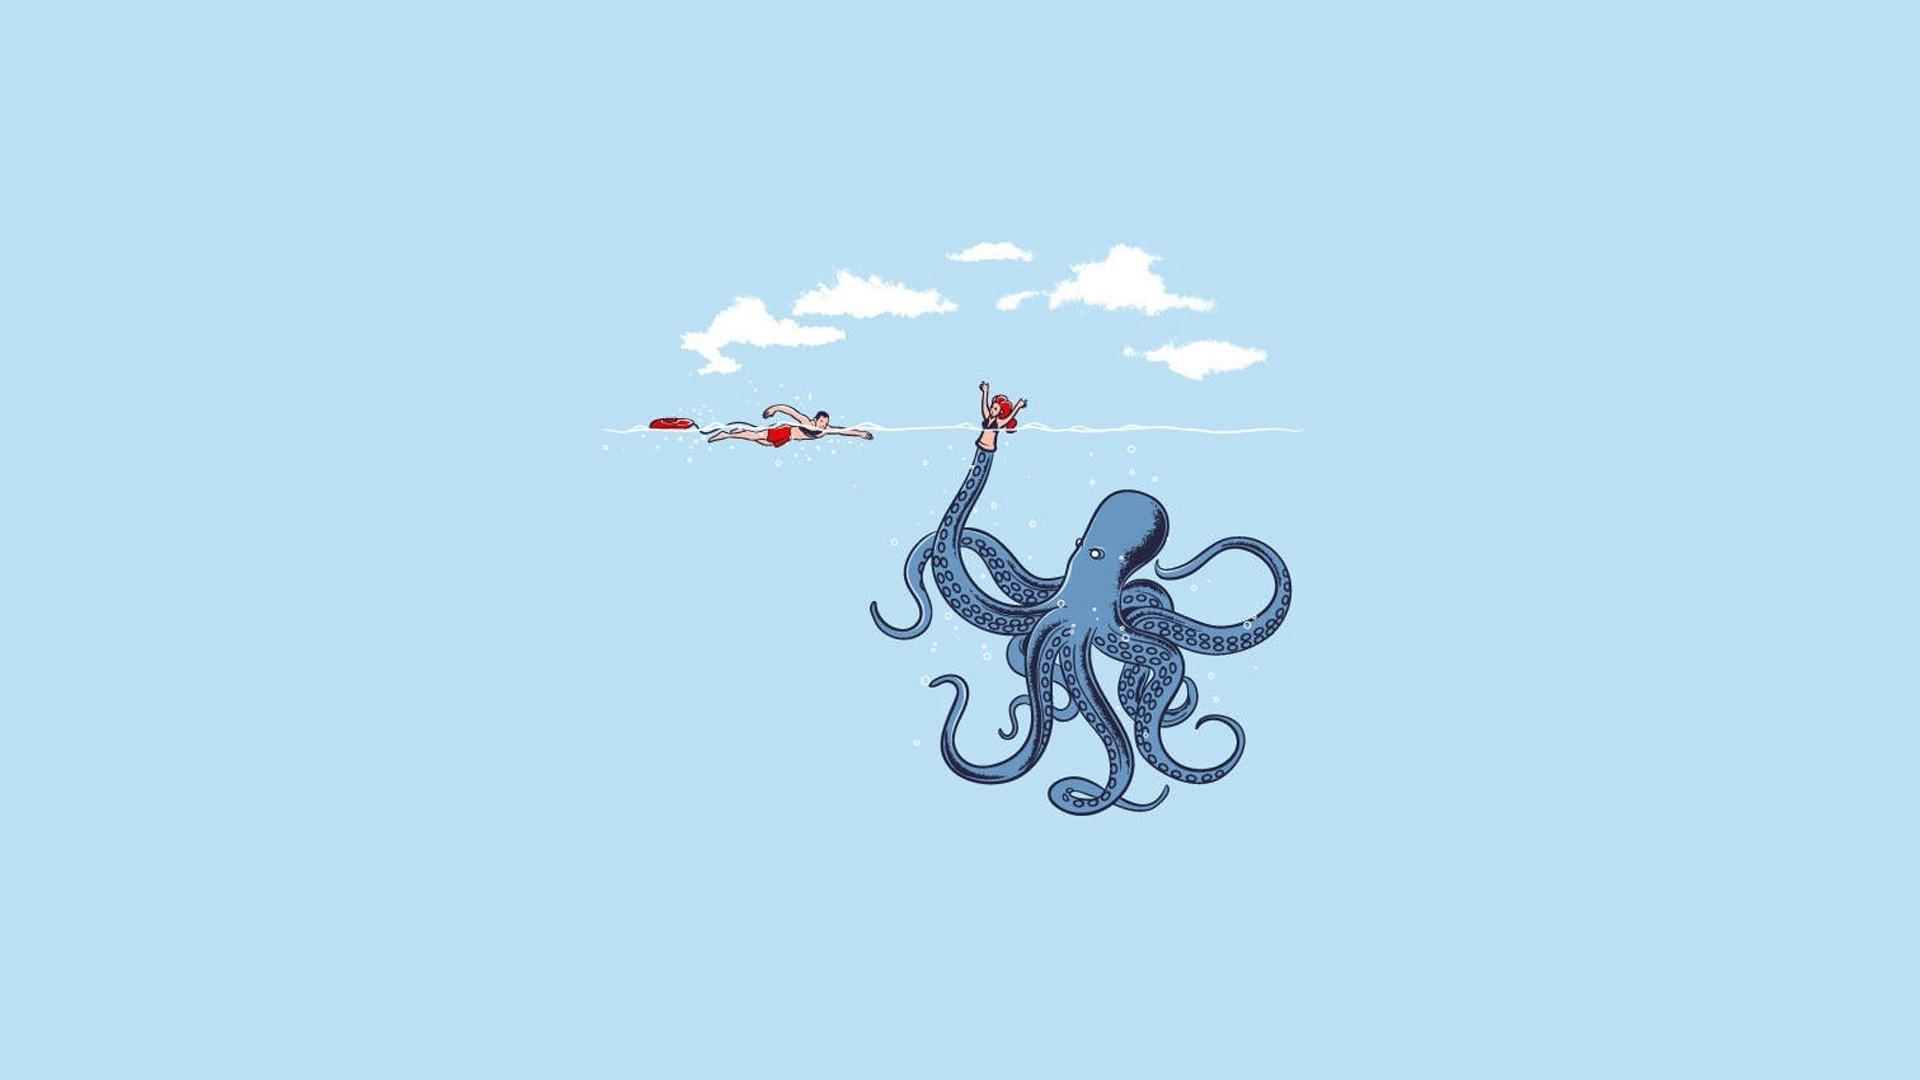 1920x1080 Px Blue Humor Minimalism Octopus Simple